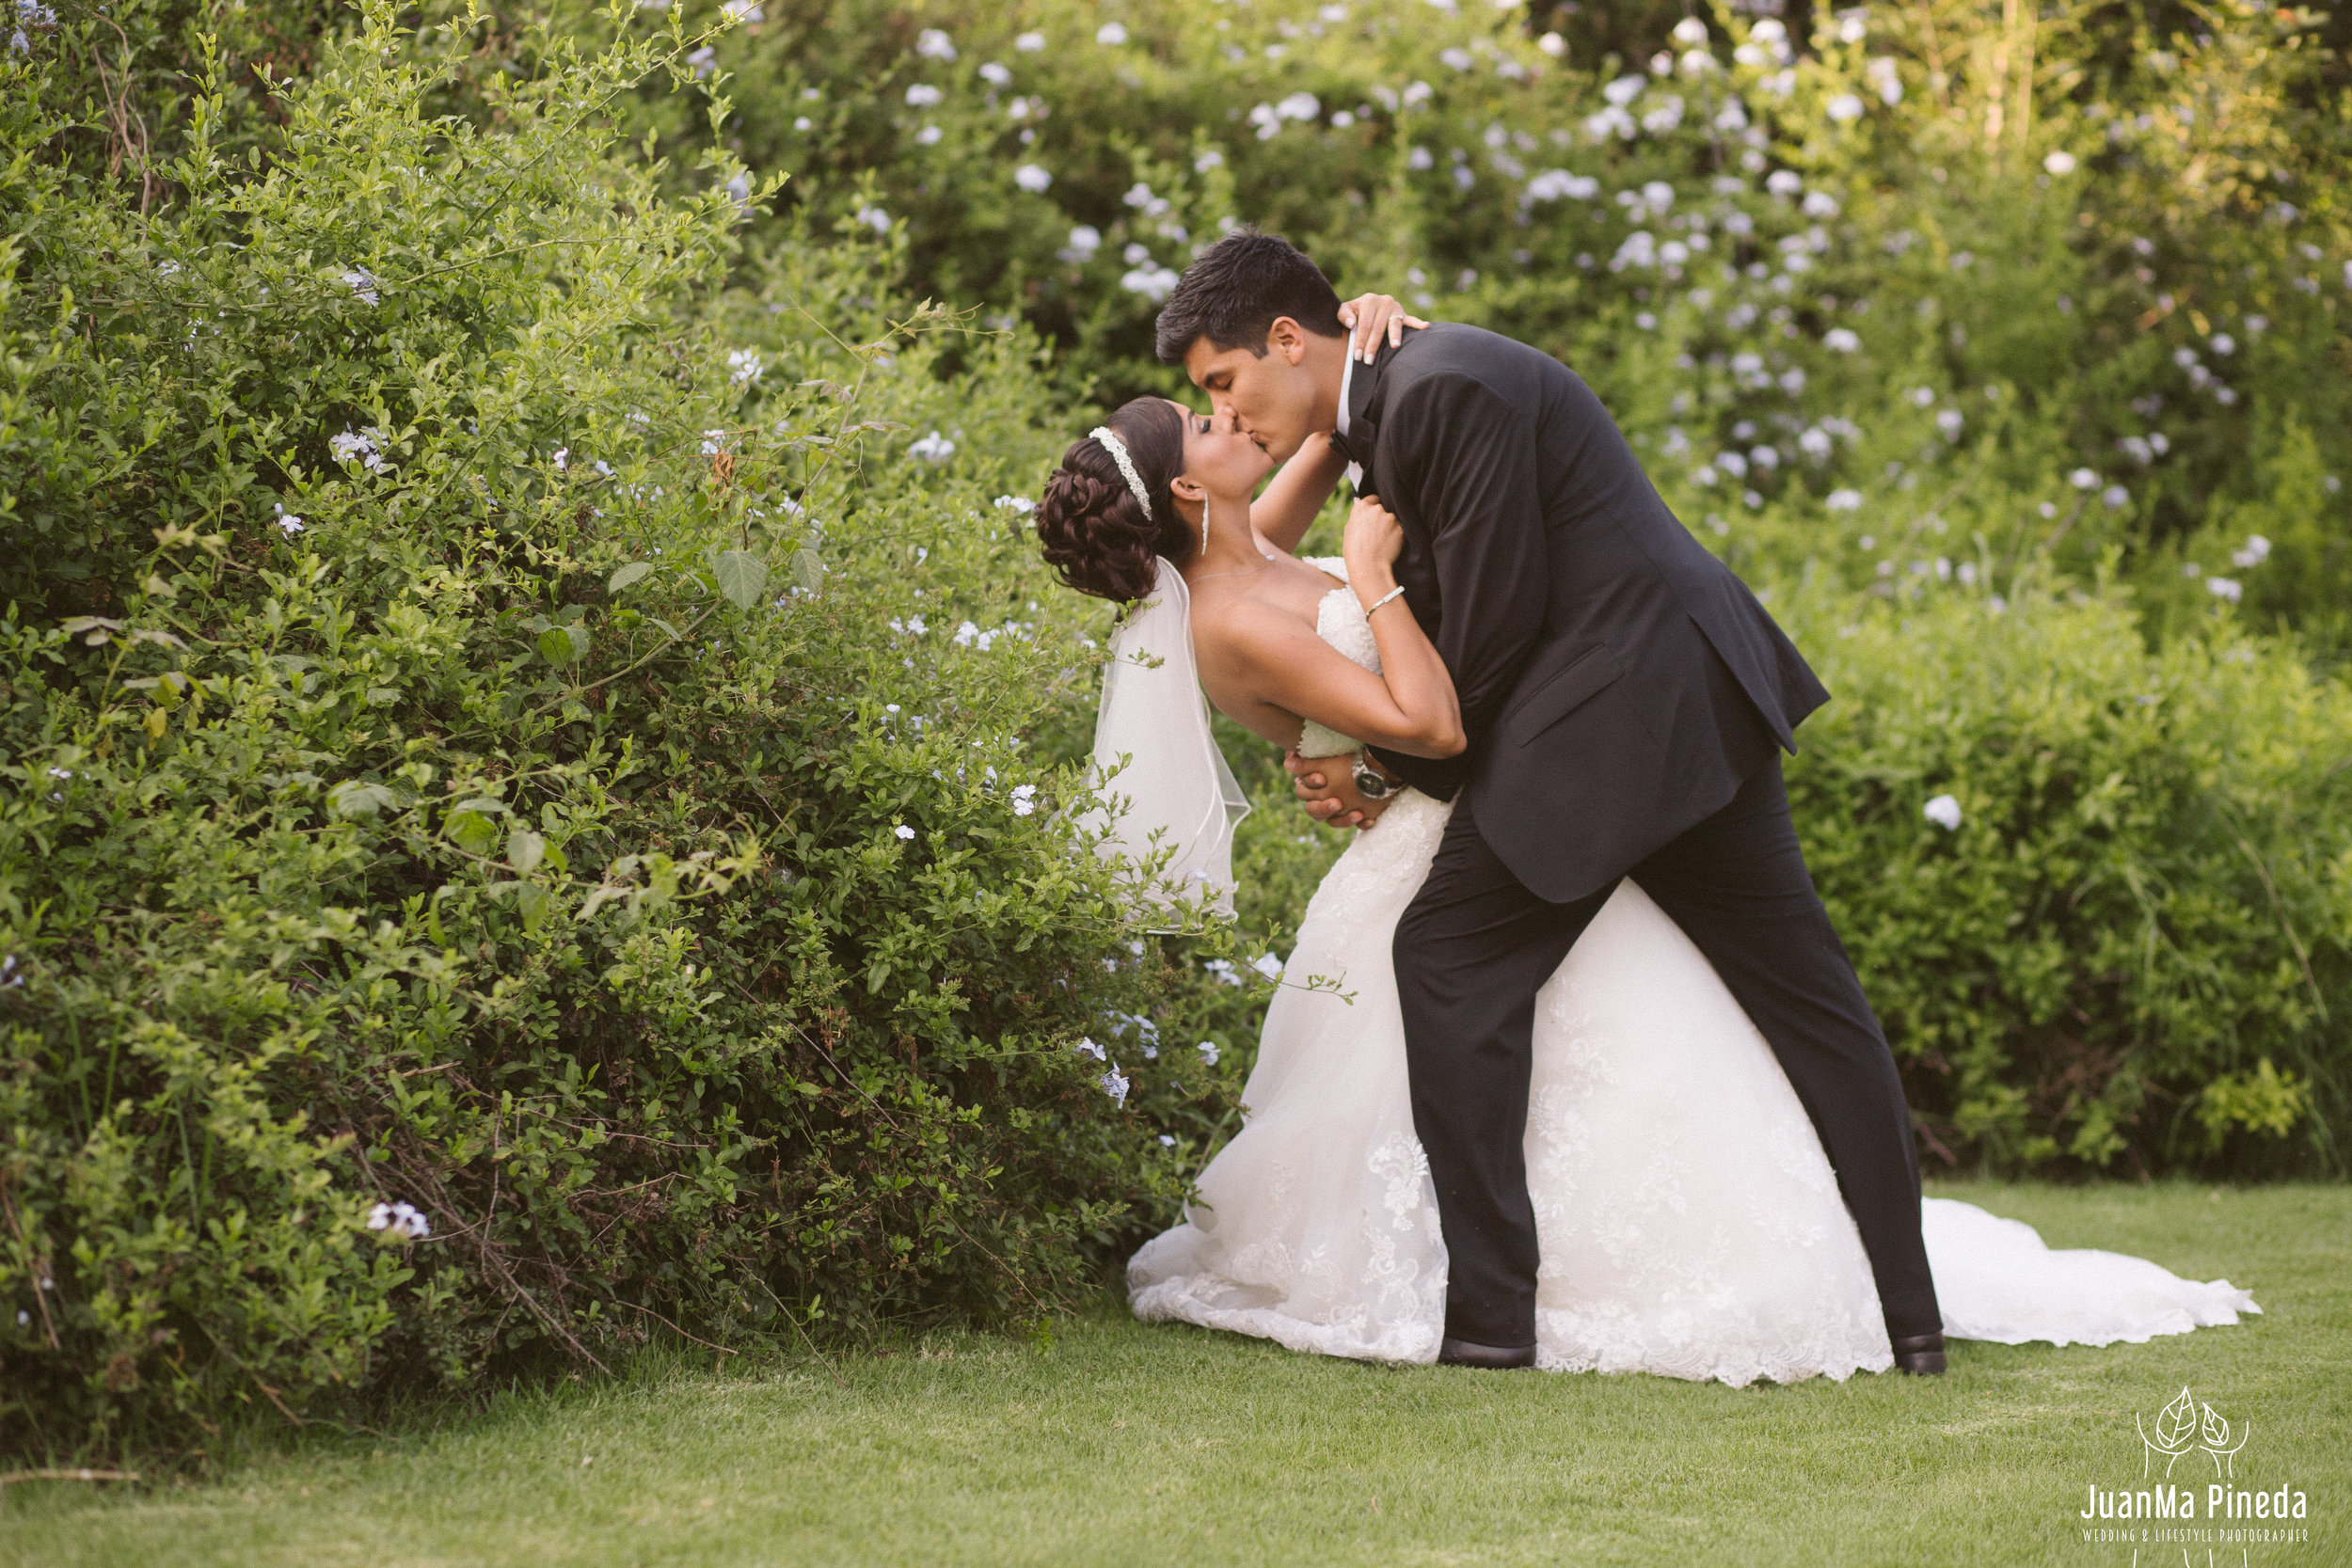 Wedding+Photographer+Mexico-1-2.jpg